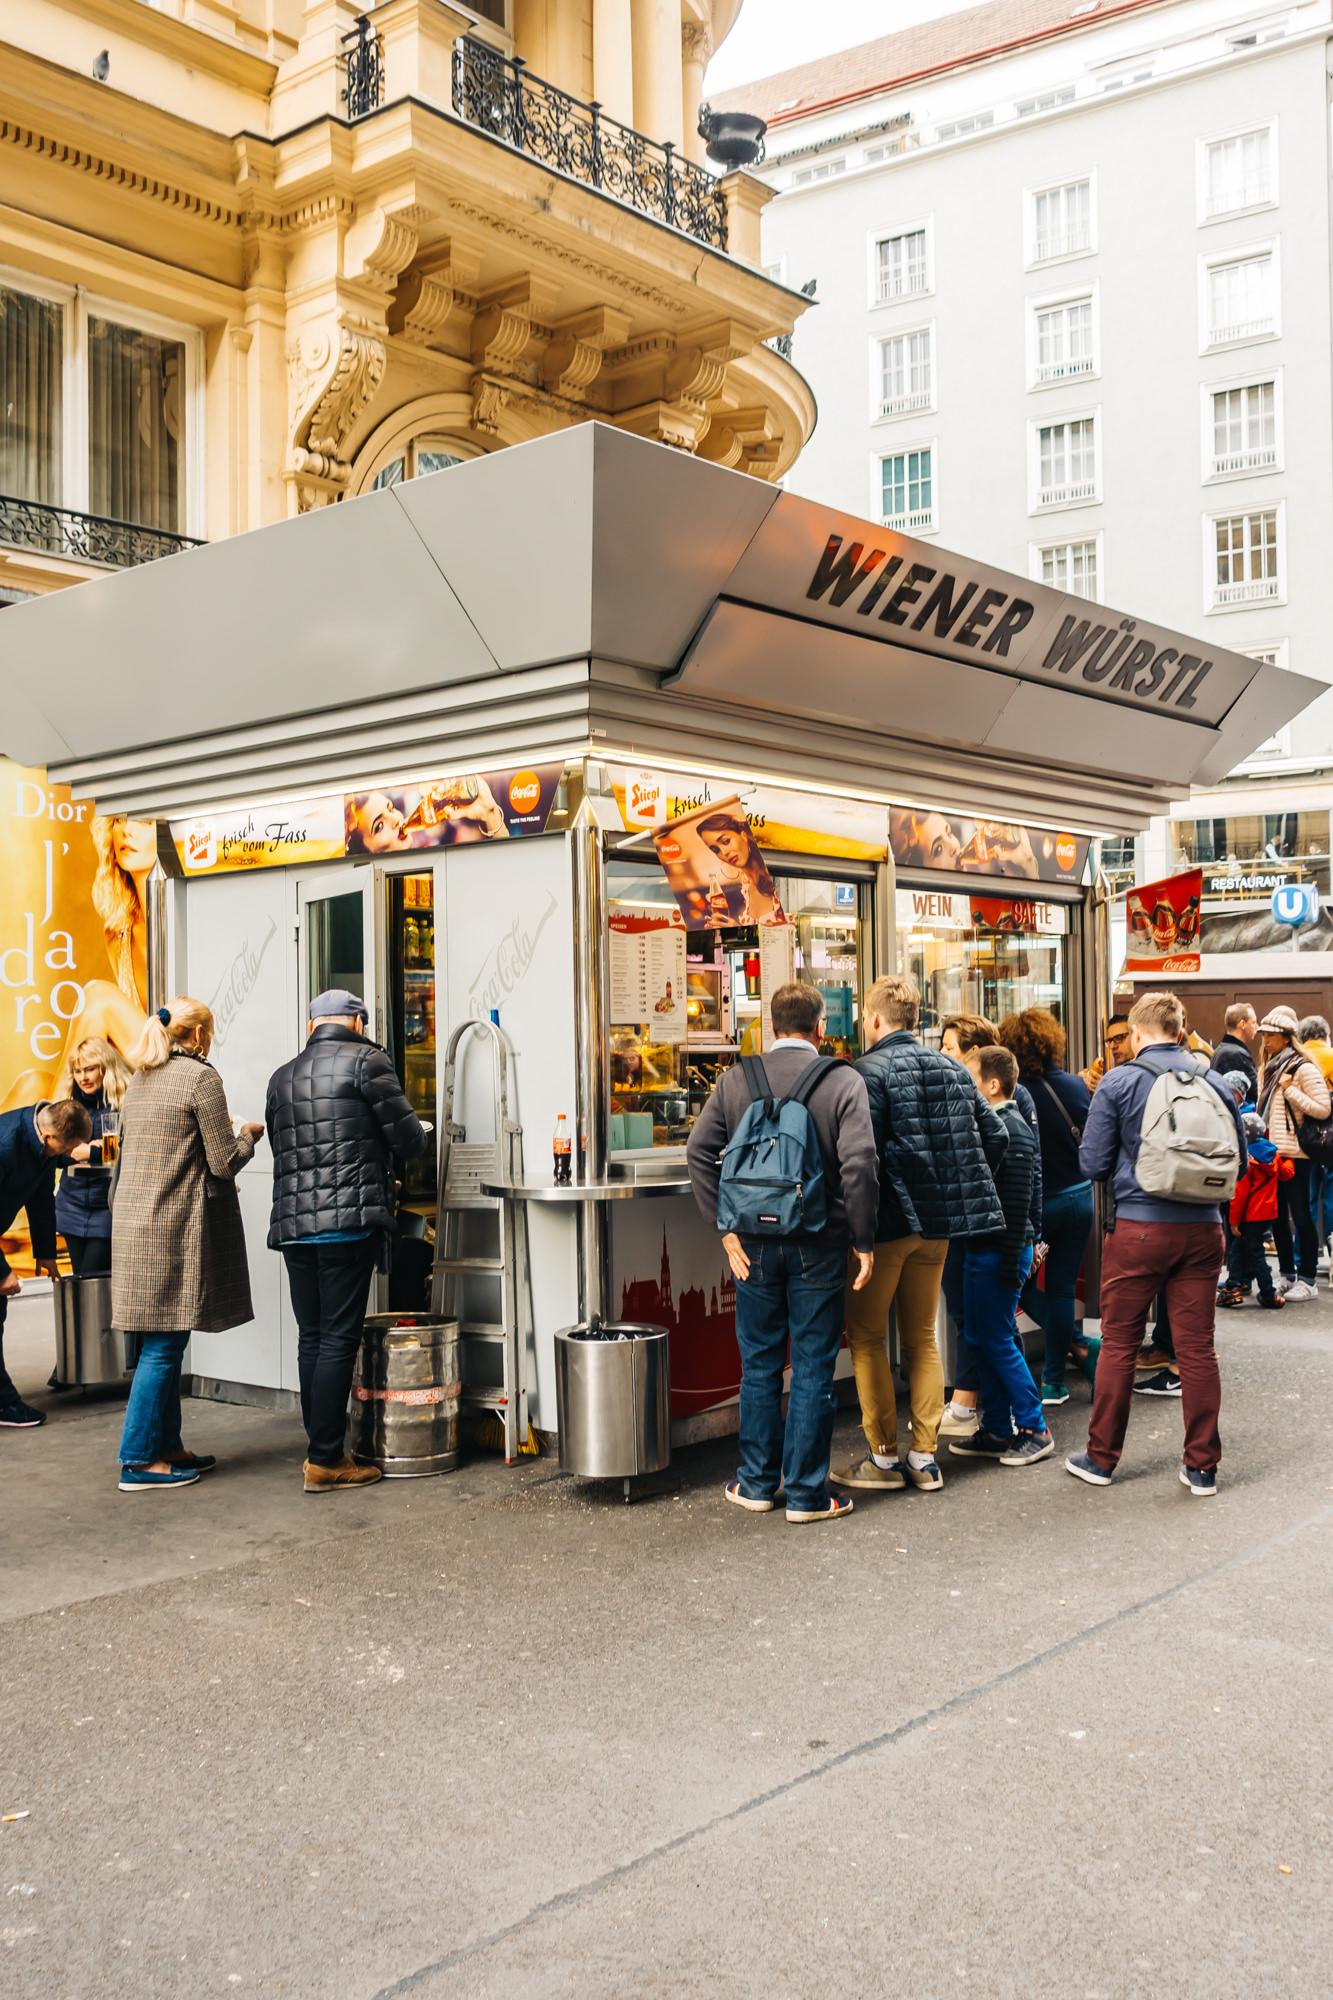 Enjoy some cheap food at Wiener Wurstl